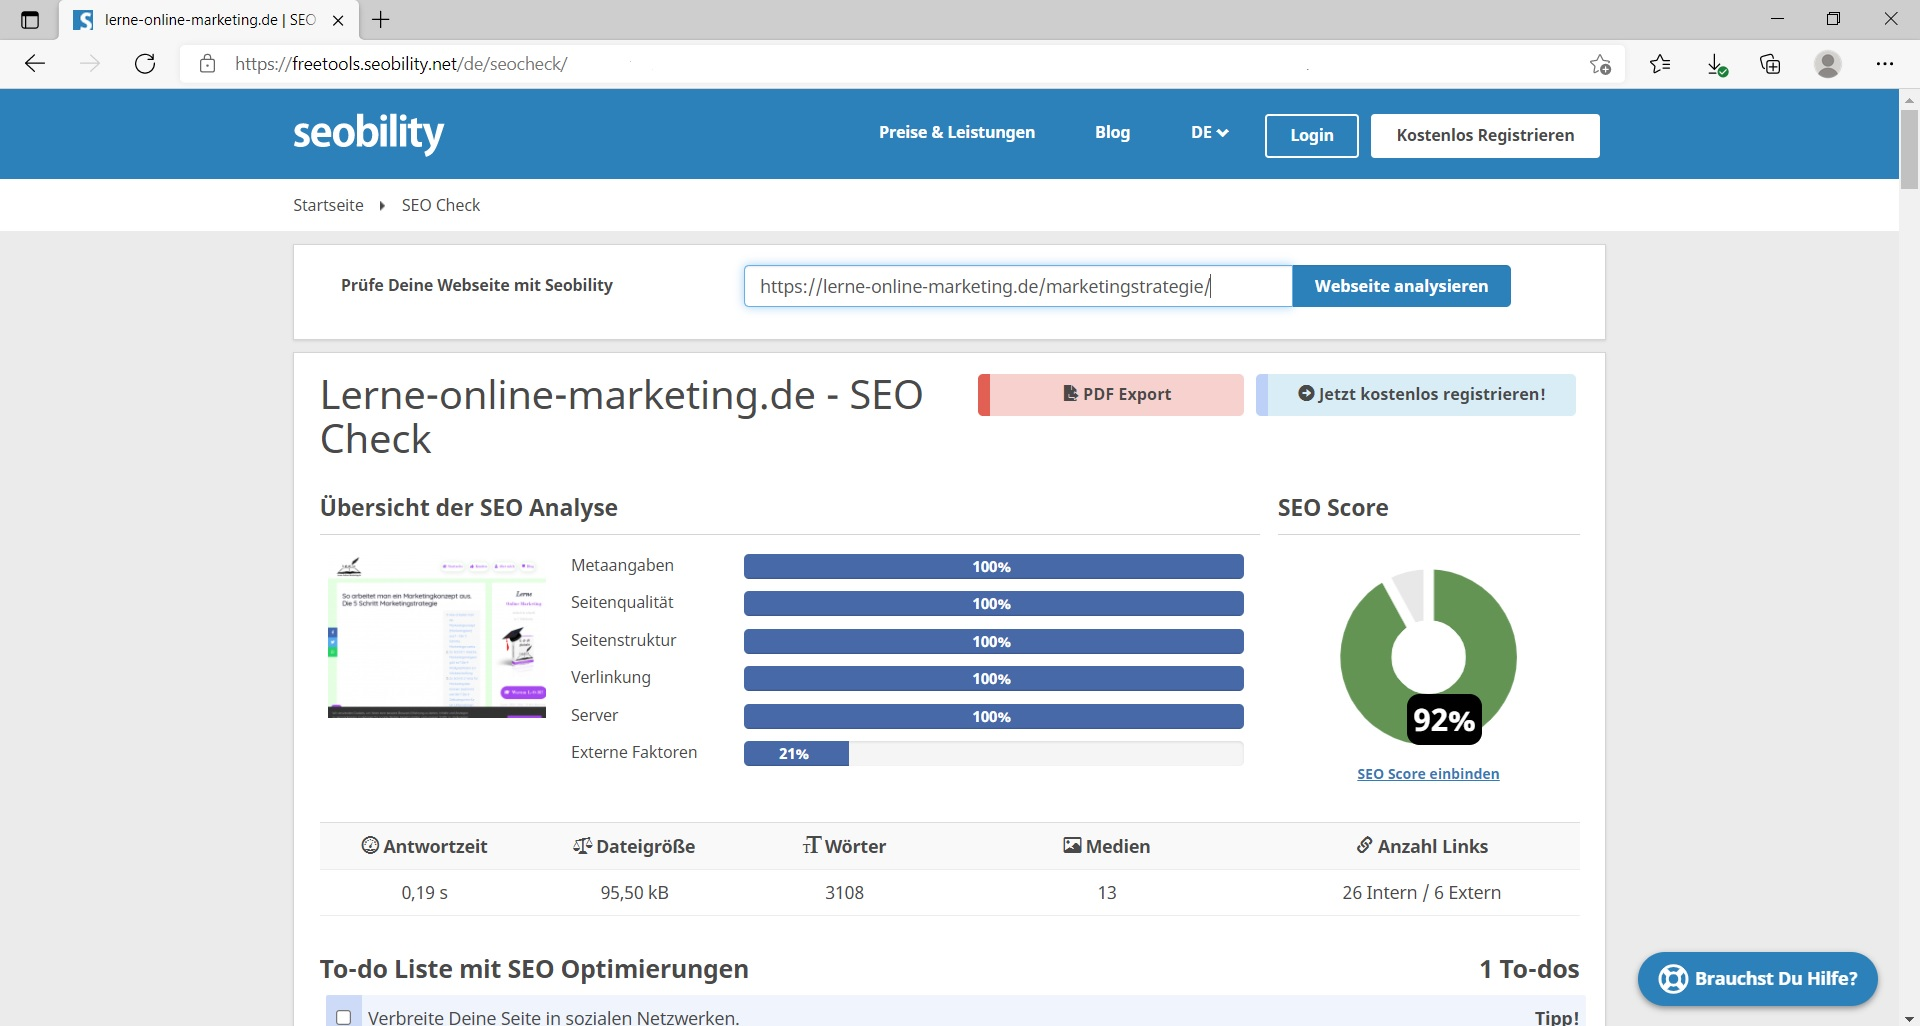 [Seobility] Blogbeitrag SEO Optimierung Tool